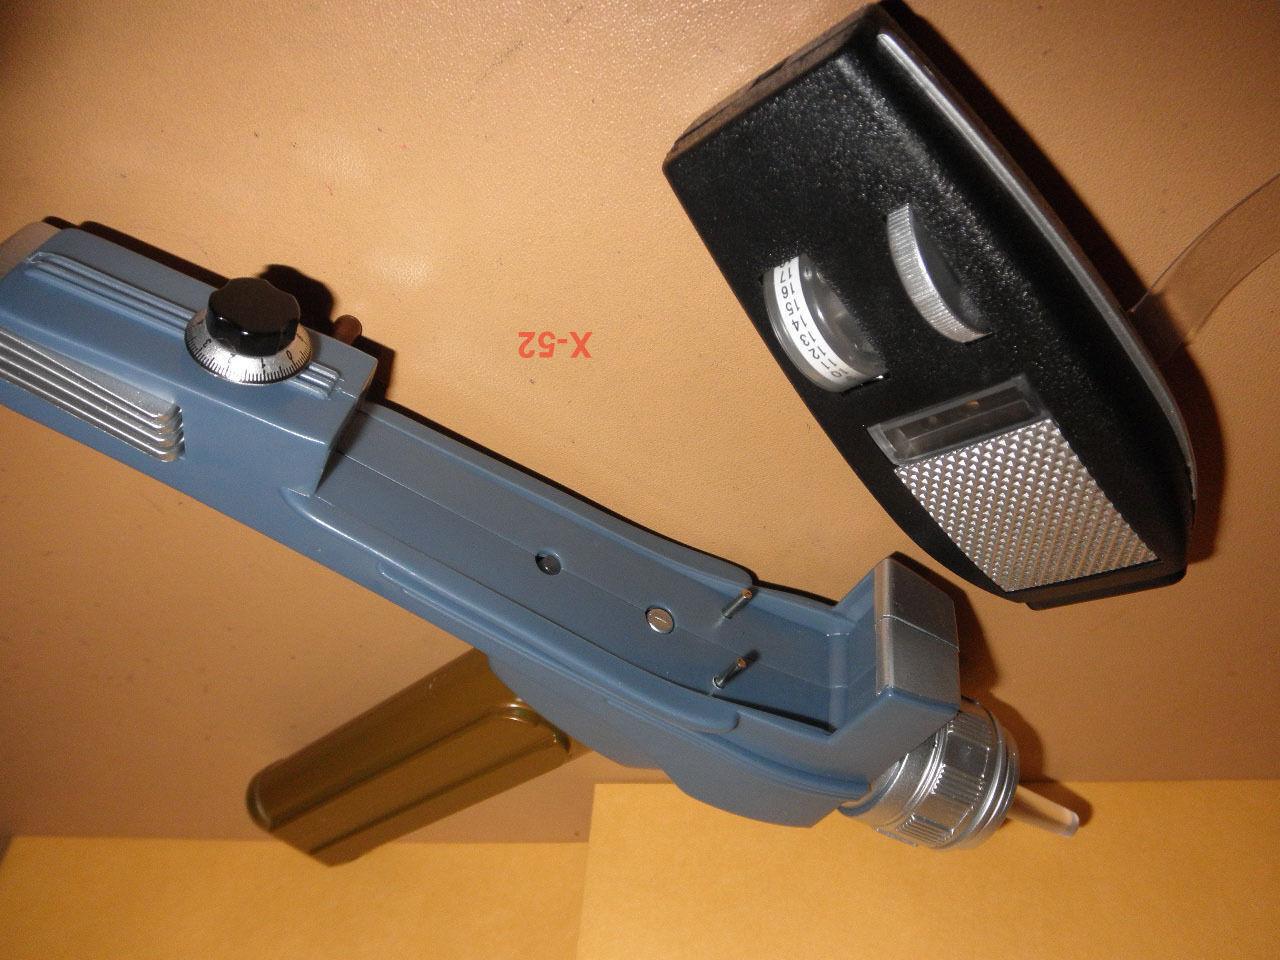 STAR TREK classic PHASER oro HANDLE VERSION toy weapon SOUND FX kirk Art Asylum